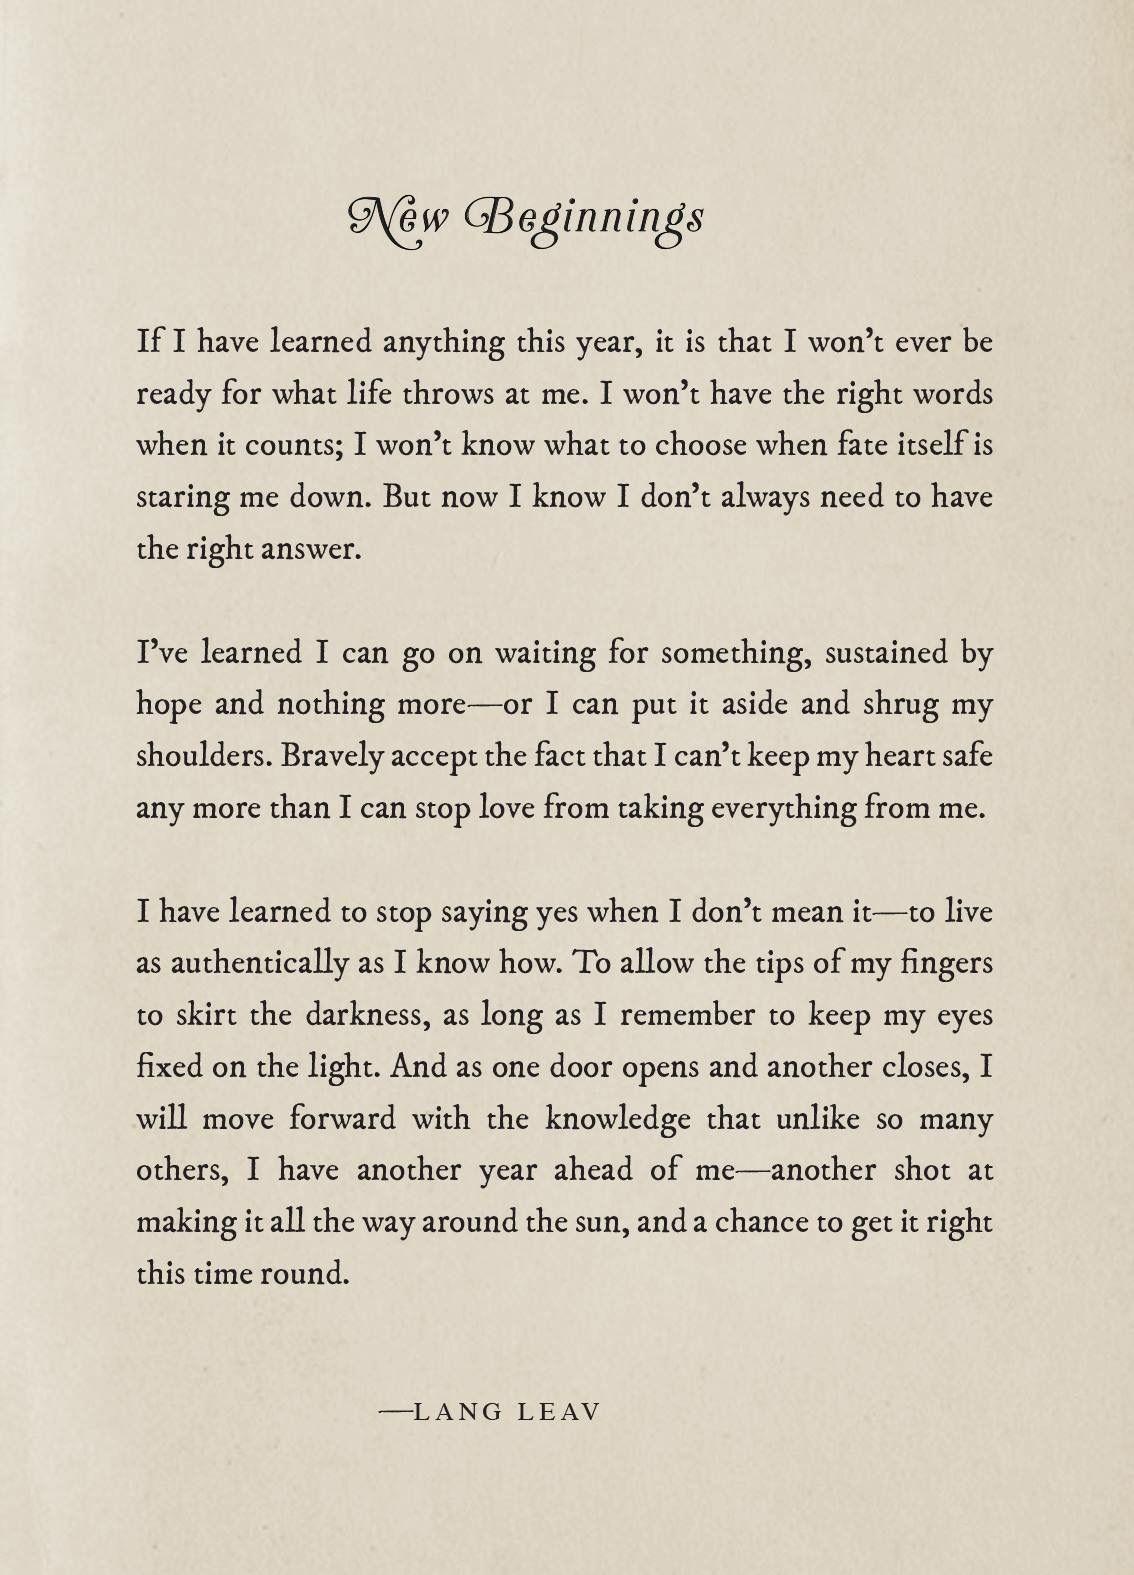 New Beginnings-Lang Leav | Sayings | Pinterest | Lang Leav, Poem and ...